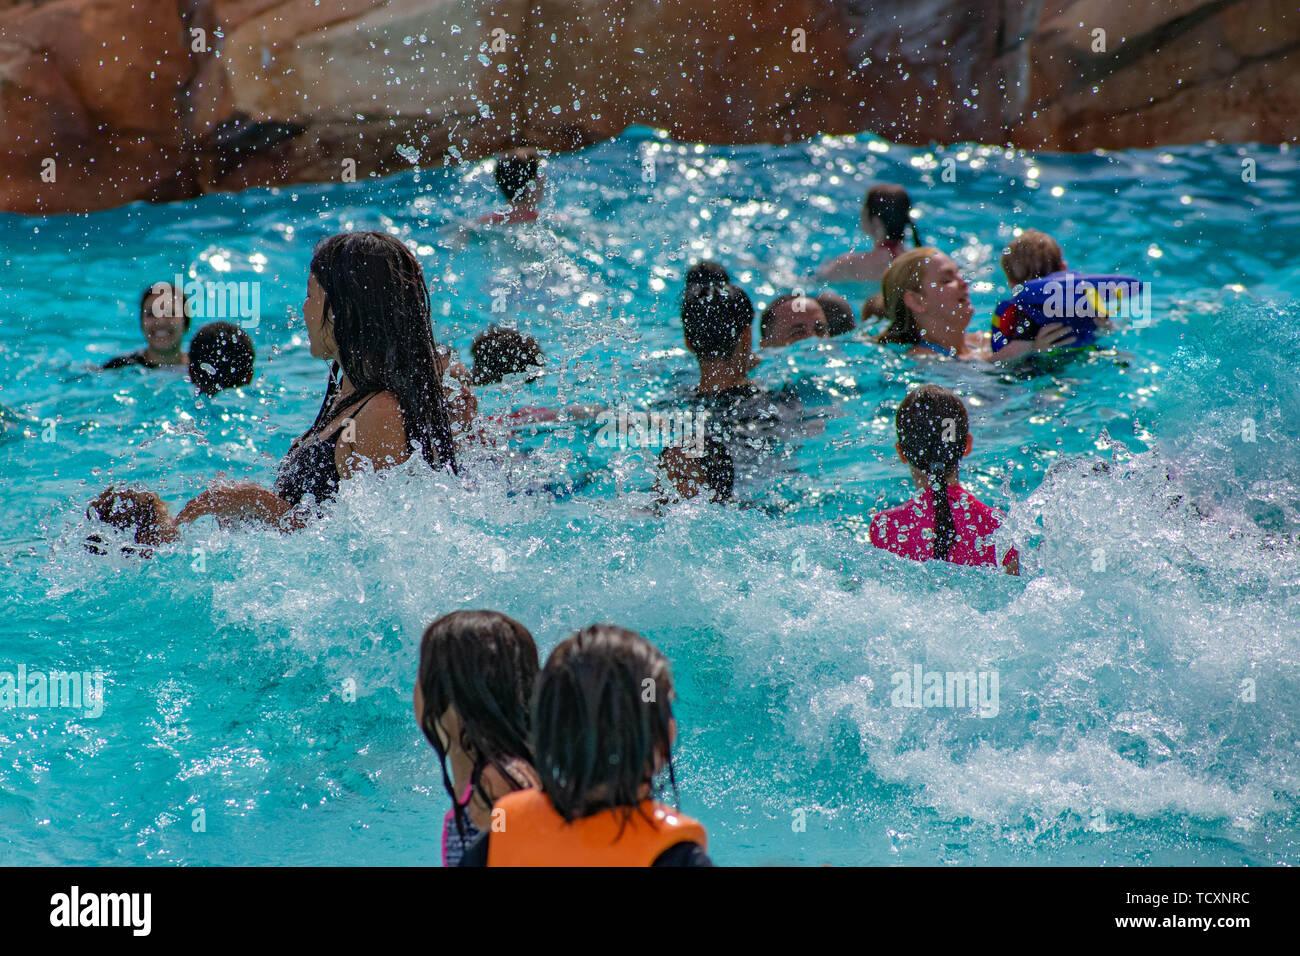 Orlando, Florida. April 07, 2019. Parents and kids having fun pool on bluelight water at Aquatica (2) Stock Photo